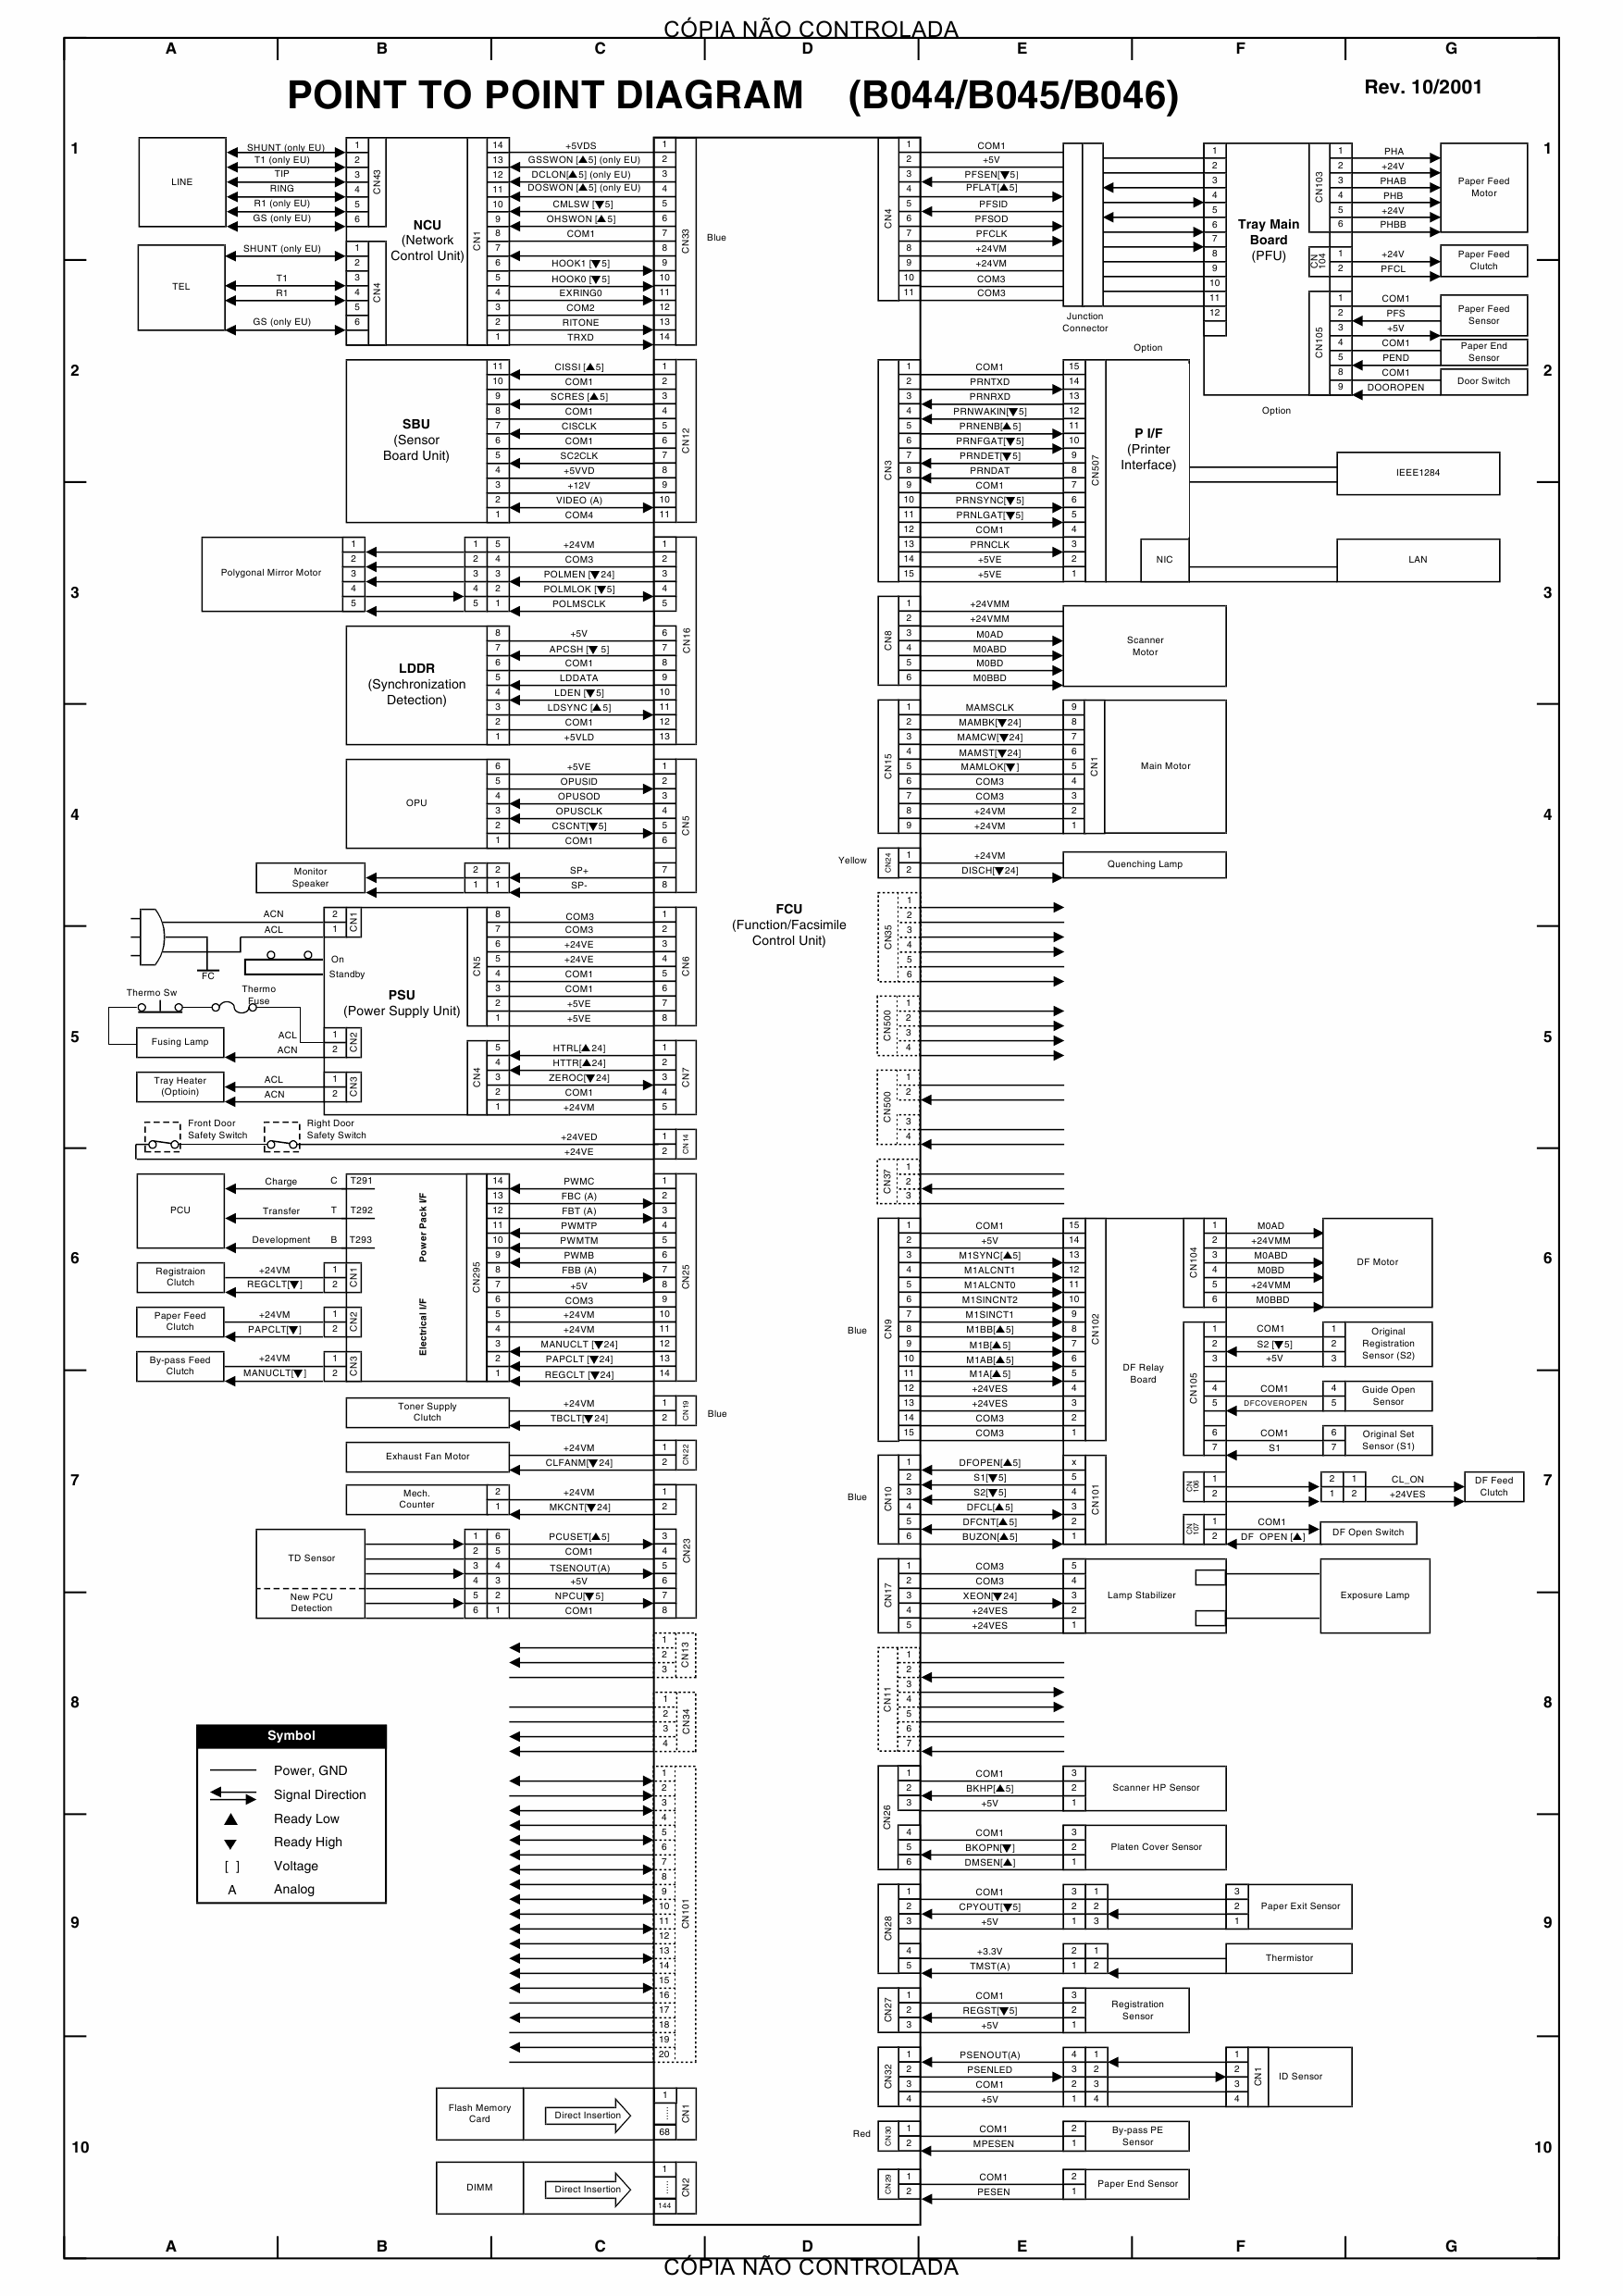 ricoh aficio 1515mf service manual